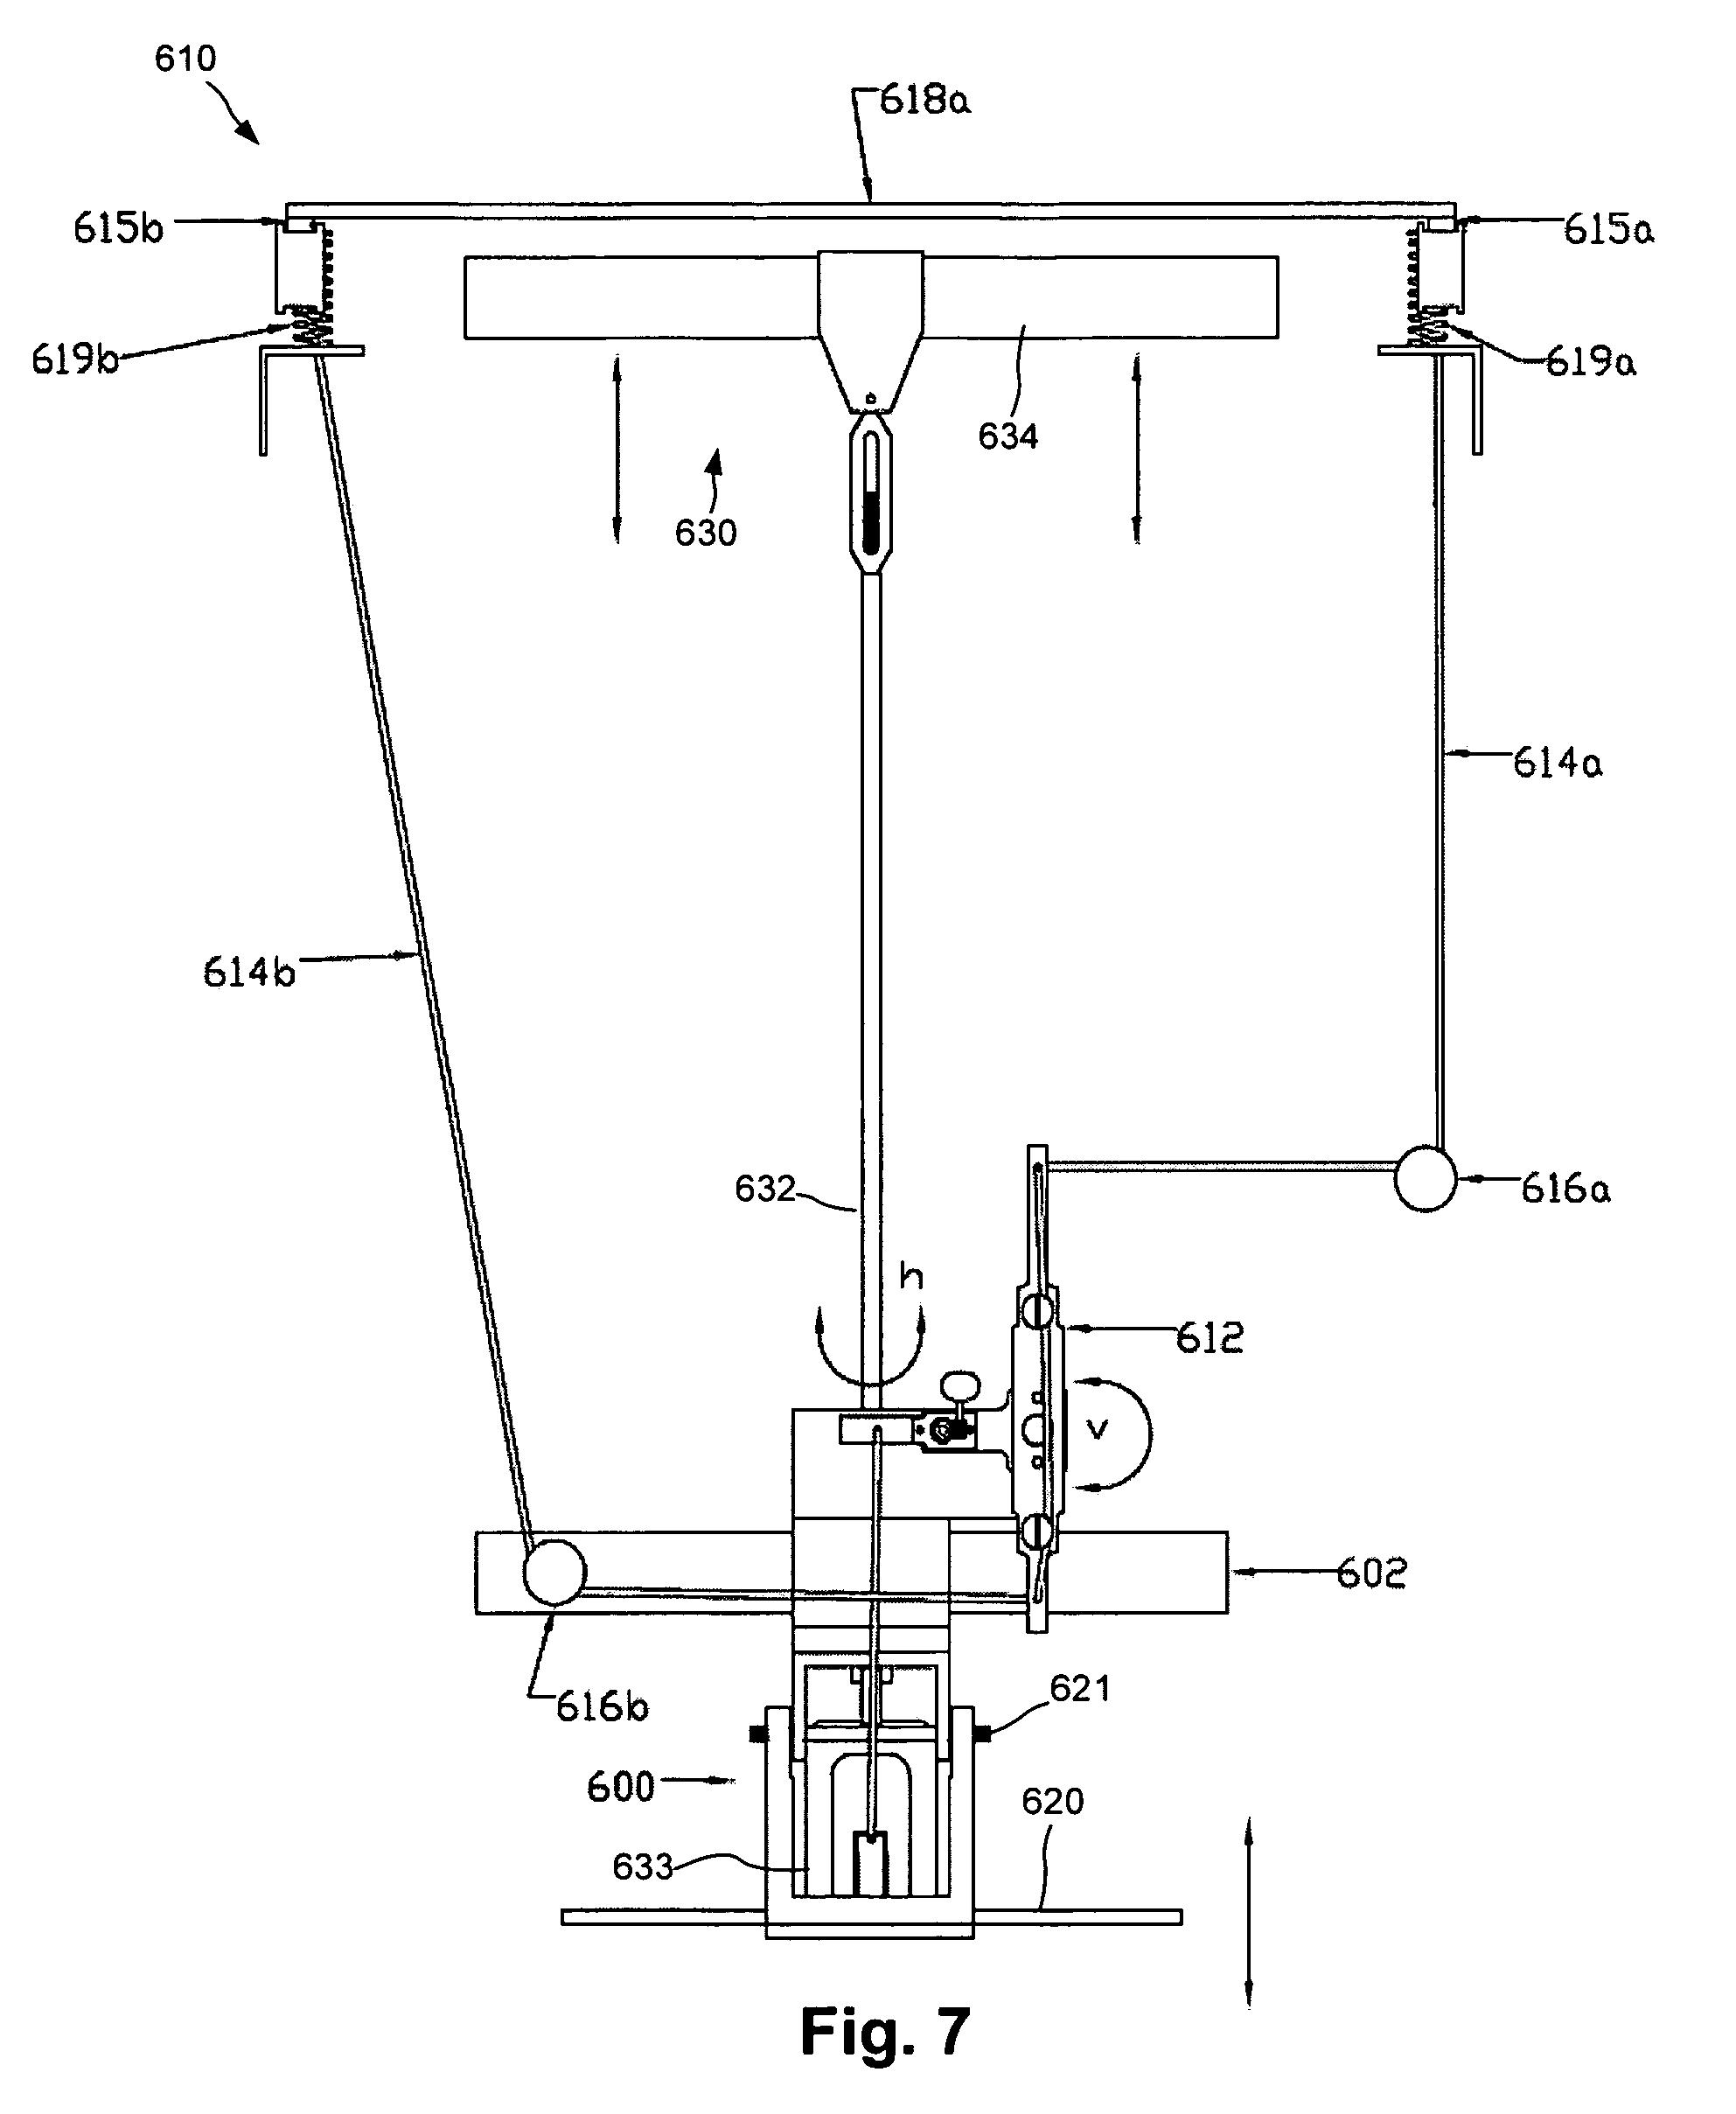 Brevet Us8525009 Multi Function Musical Instrument Pedal Keyboard Sustain Wiring Diagram Patent Drawing